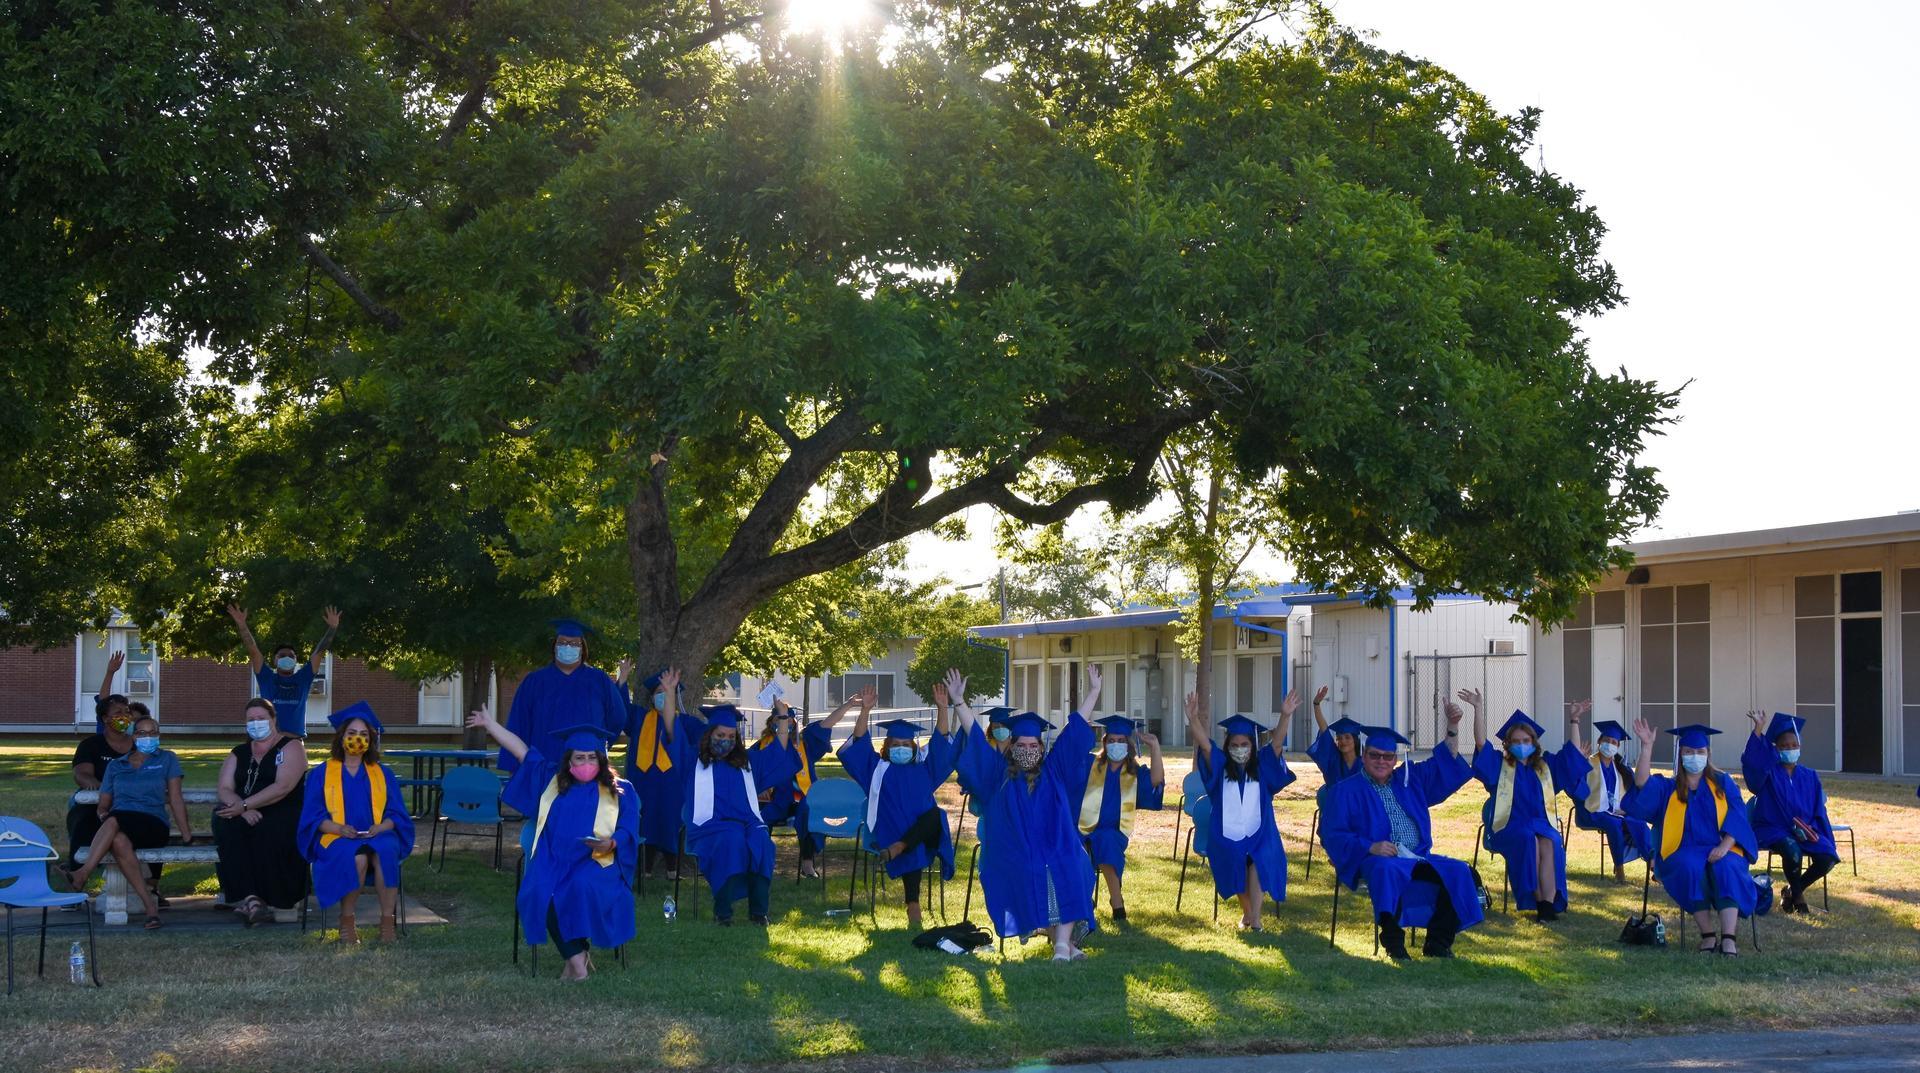 Outdoor social distancing graduates of summer 2020